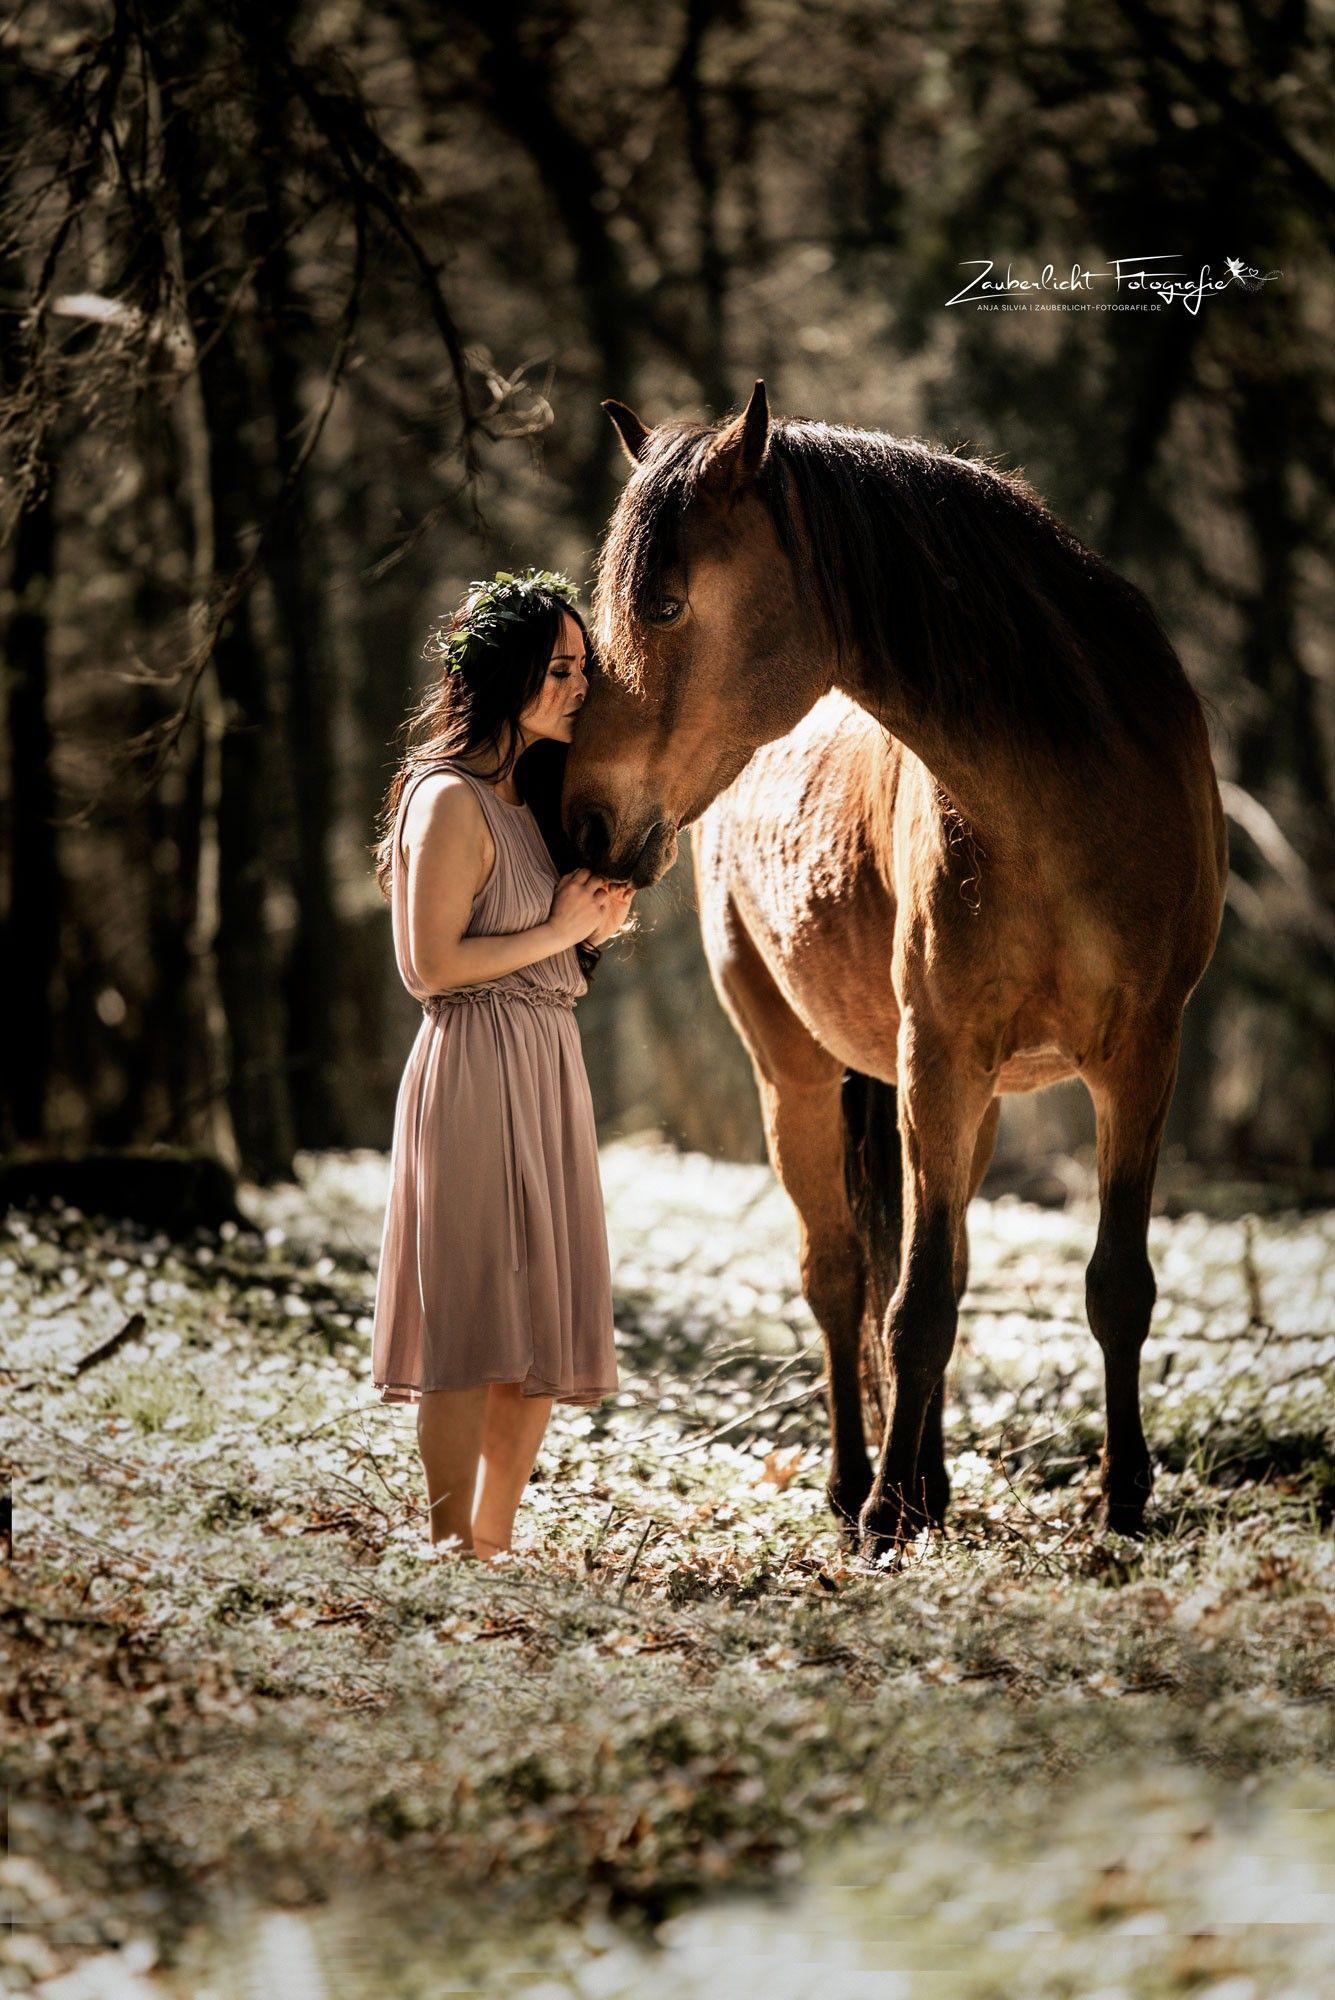 Zauberfee Zauberlicht Pferd Bilder Pferdeshooting Fotoshooting Pferdef In 2020 Equine Photography Poses Horse Photography Poses Beautiful Horses Photography